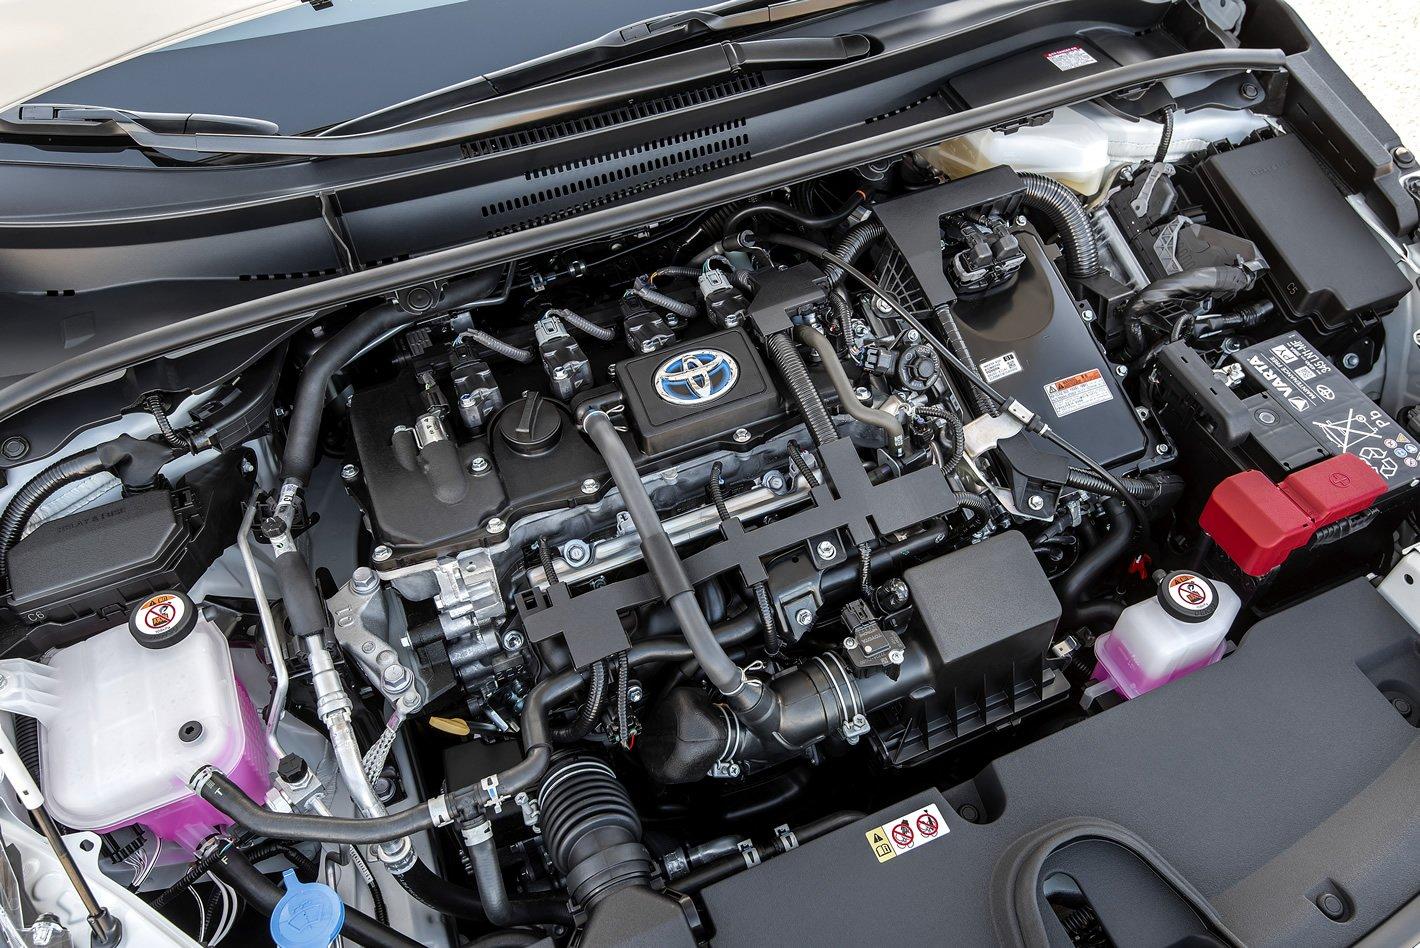 Toyota Corolla 2.0 l Hybrid 2019